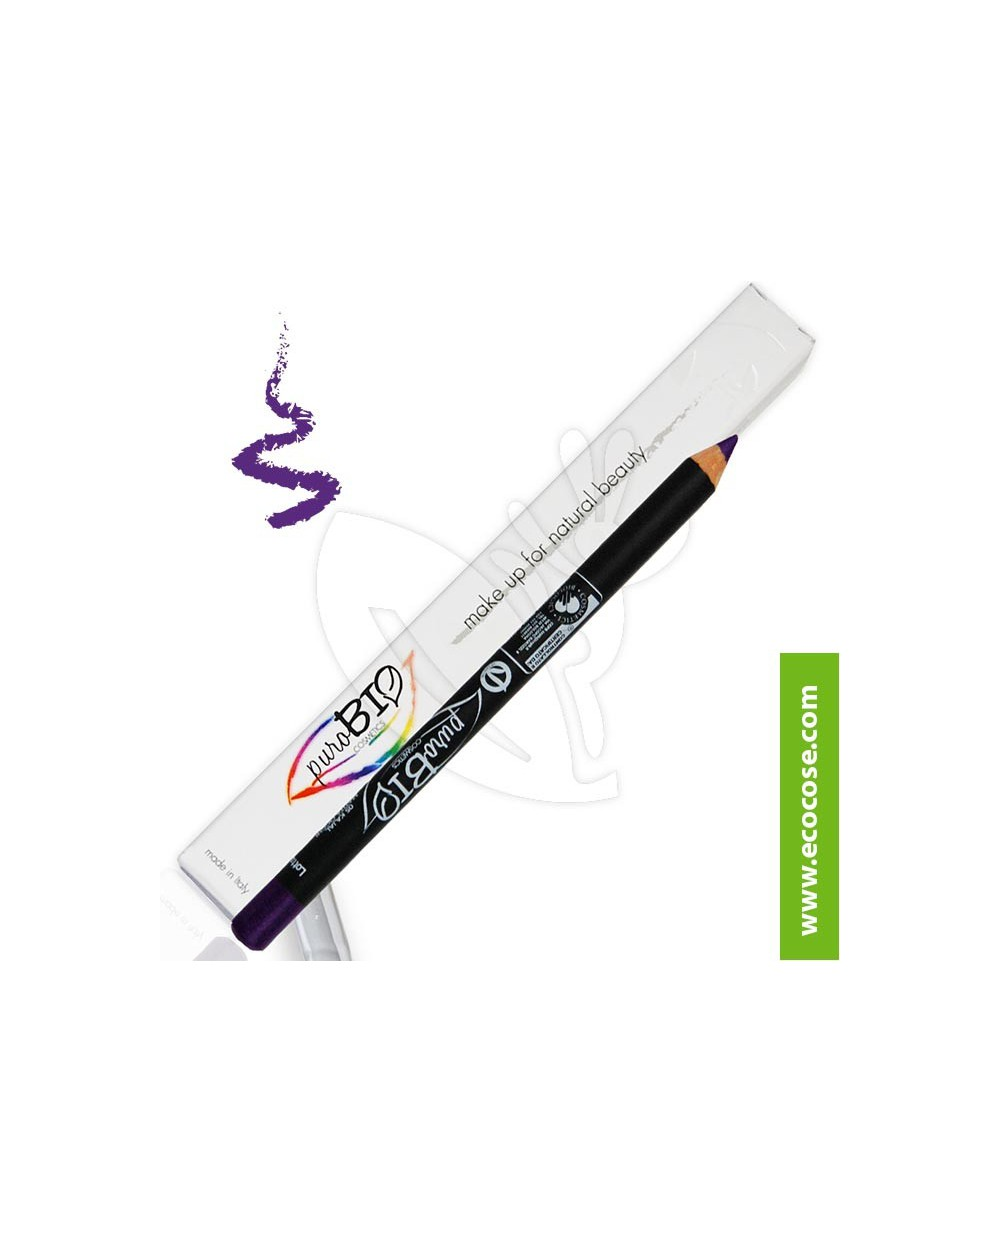 PuroBIO Cosmetics - Matita Biologica Occhi 05 Viola